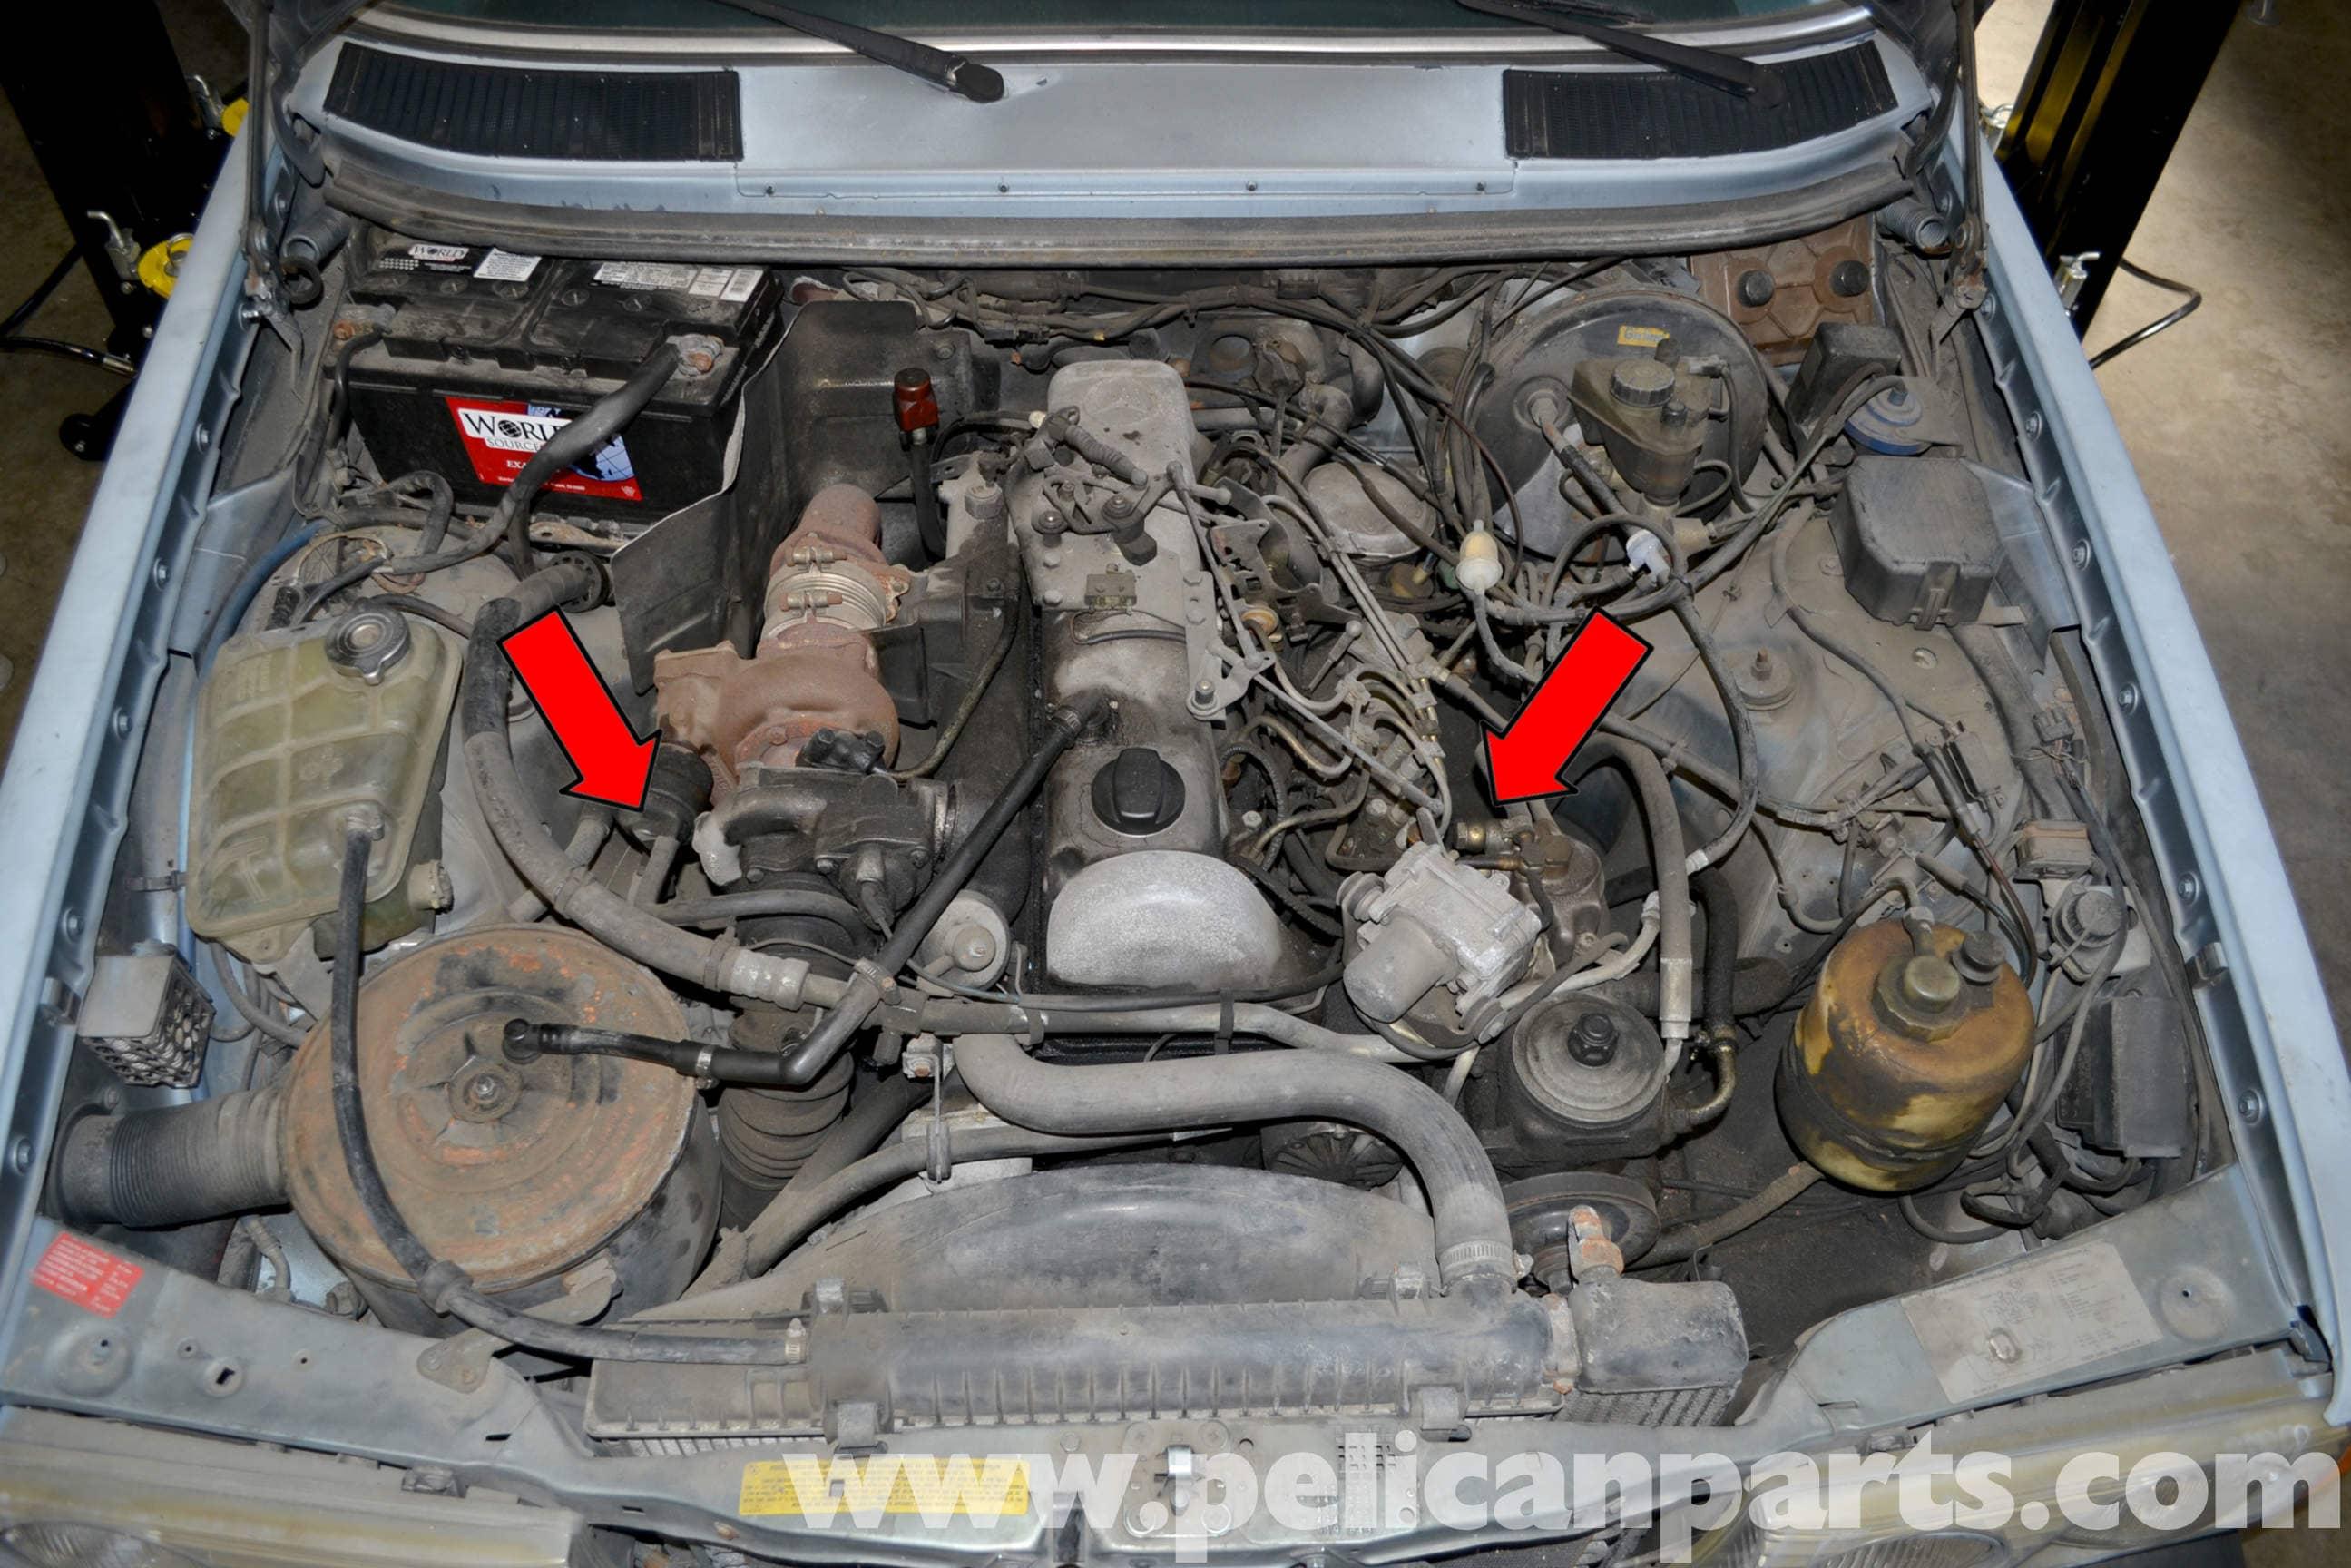 Mercedes W123 300 Engine Shock Mounting KITS 2 Sets Bushings Damper Strut Mount